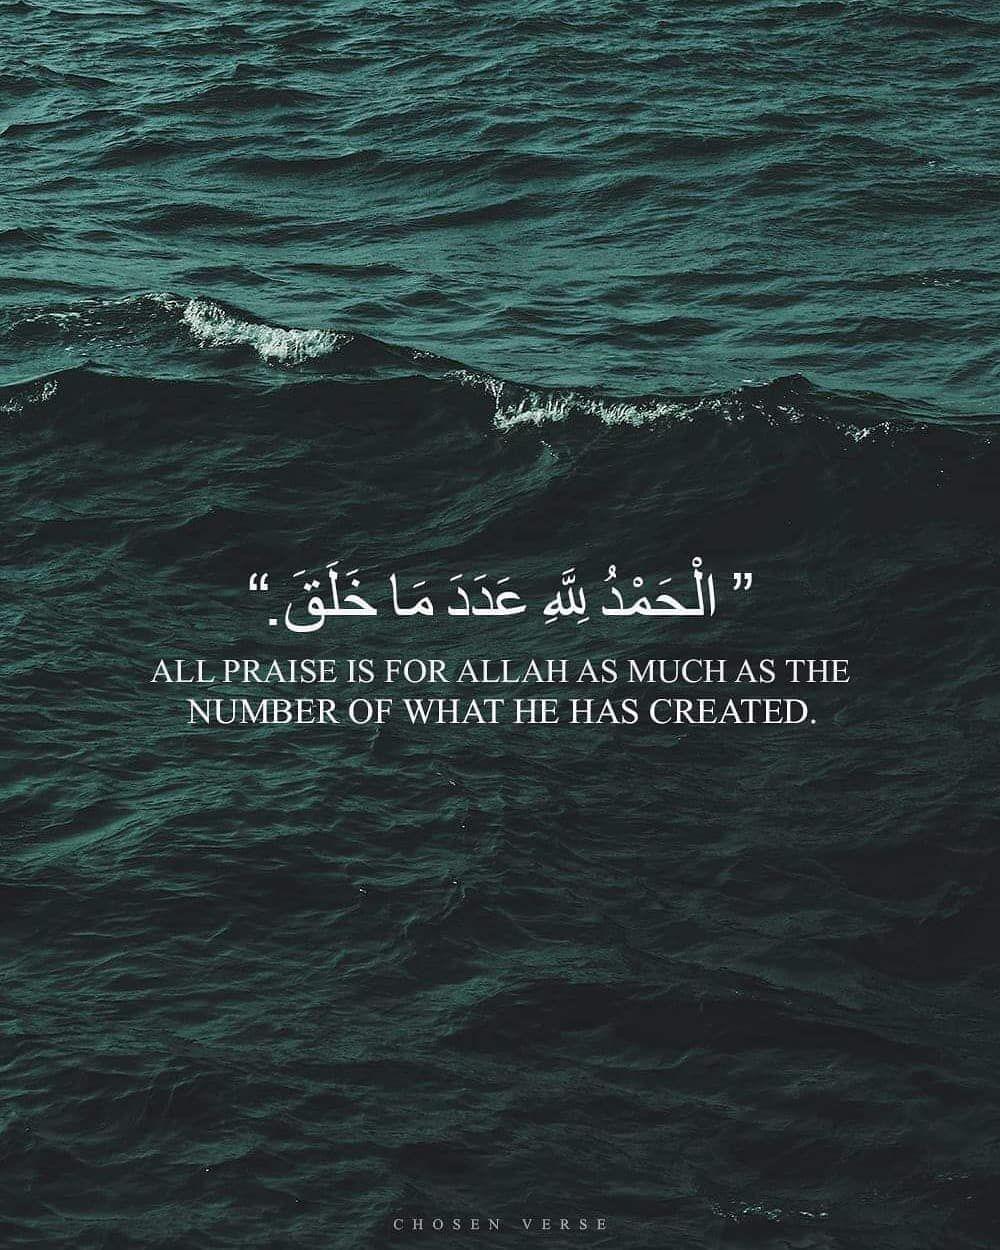 Chosen Verse On Instagram Alhamdulillah Islam Deen Dawah Reminders Dua الحمدلله دعوة تذكير اس Islamic Quotes Islamic Quotes Quran Quran Quotes Love